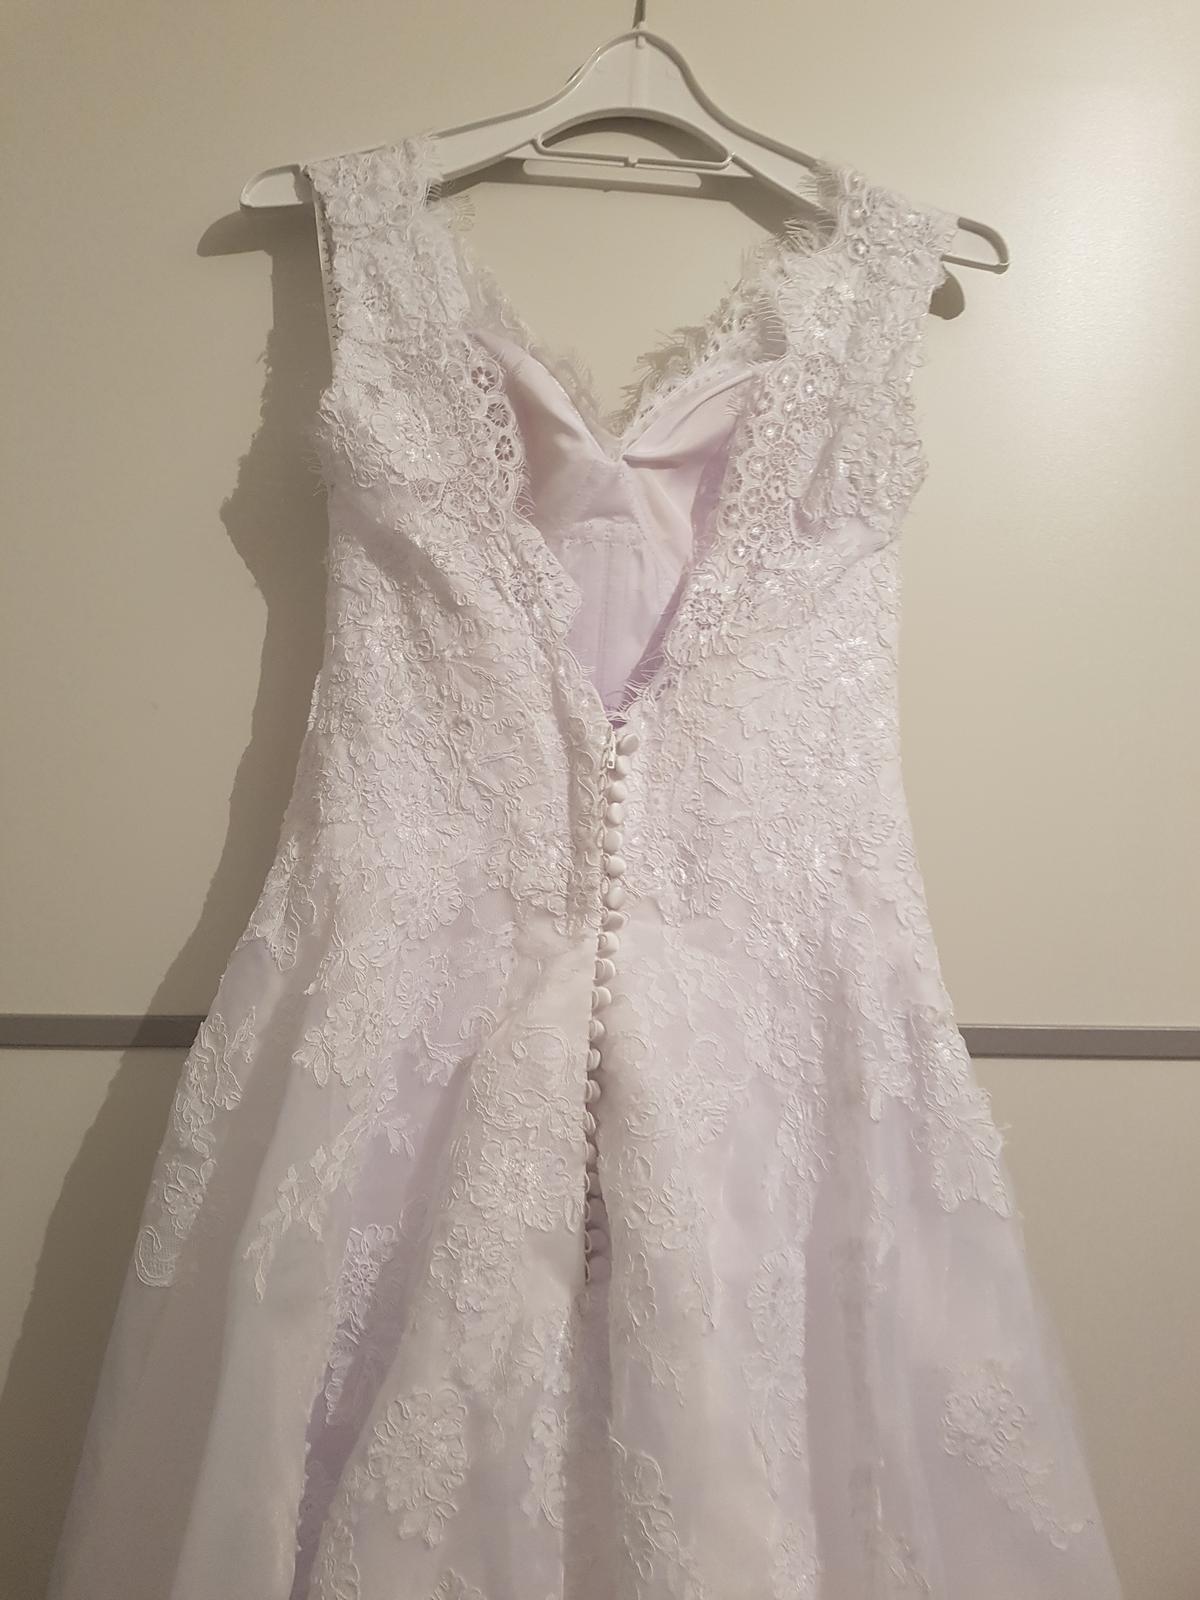 Svadobné šaty Cocomelody - Obrázok č. 2